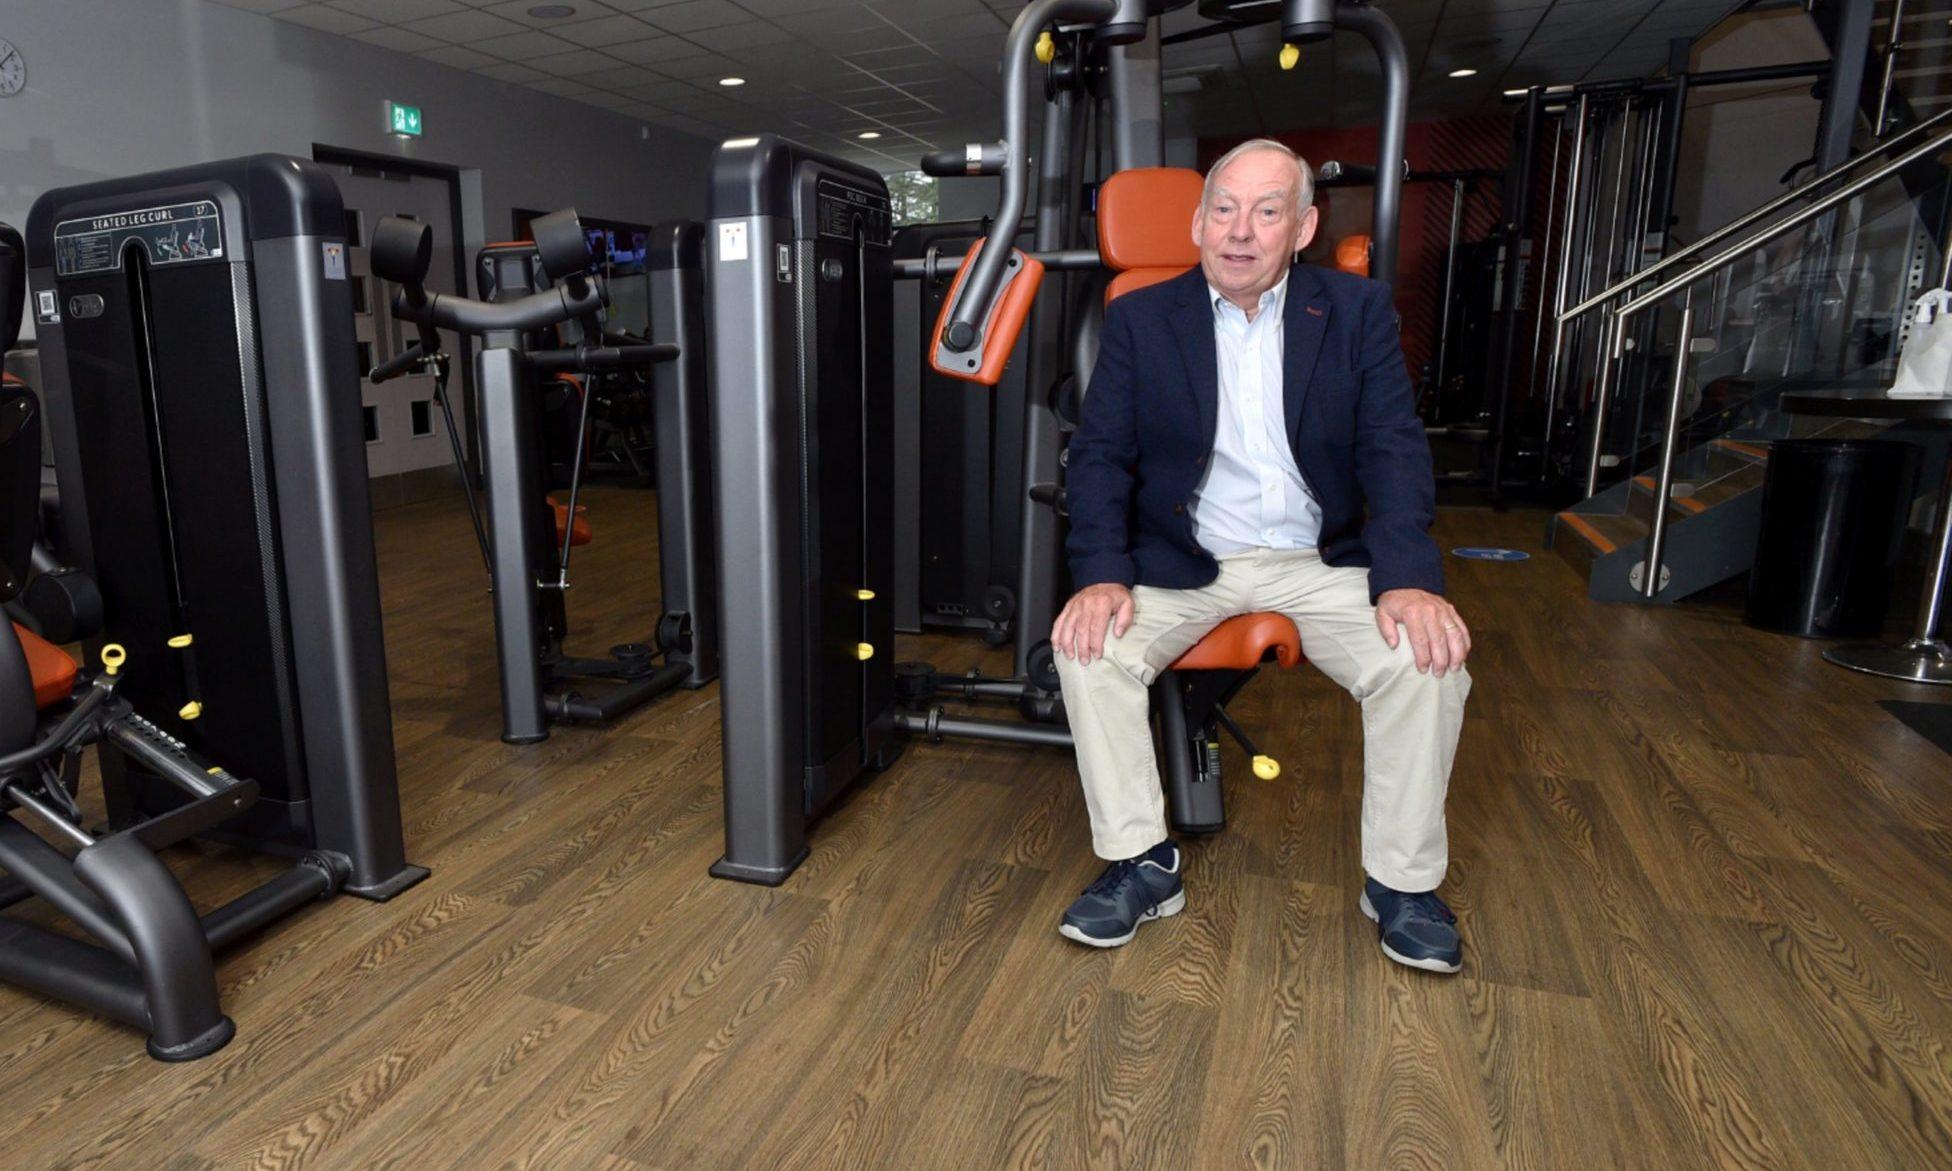 Sport Aberdeen Chairman Tony Dawson prepares for the reopening of Get Active @ Jesmond, Bridge of Don, Aberdeen.